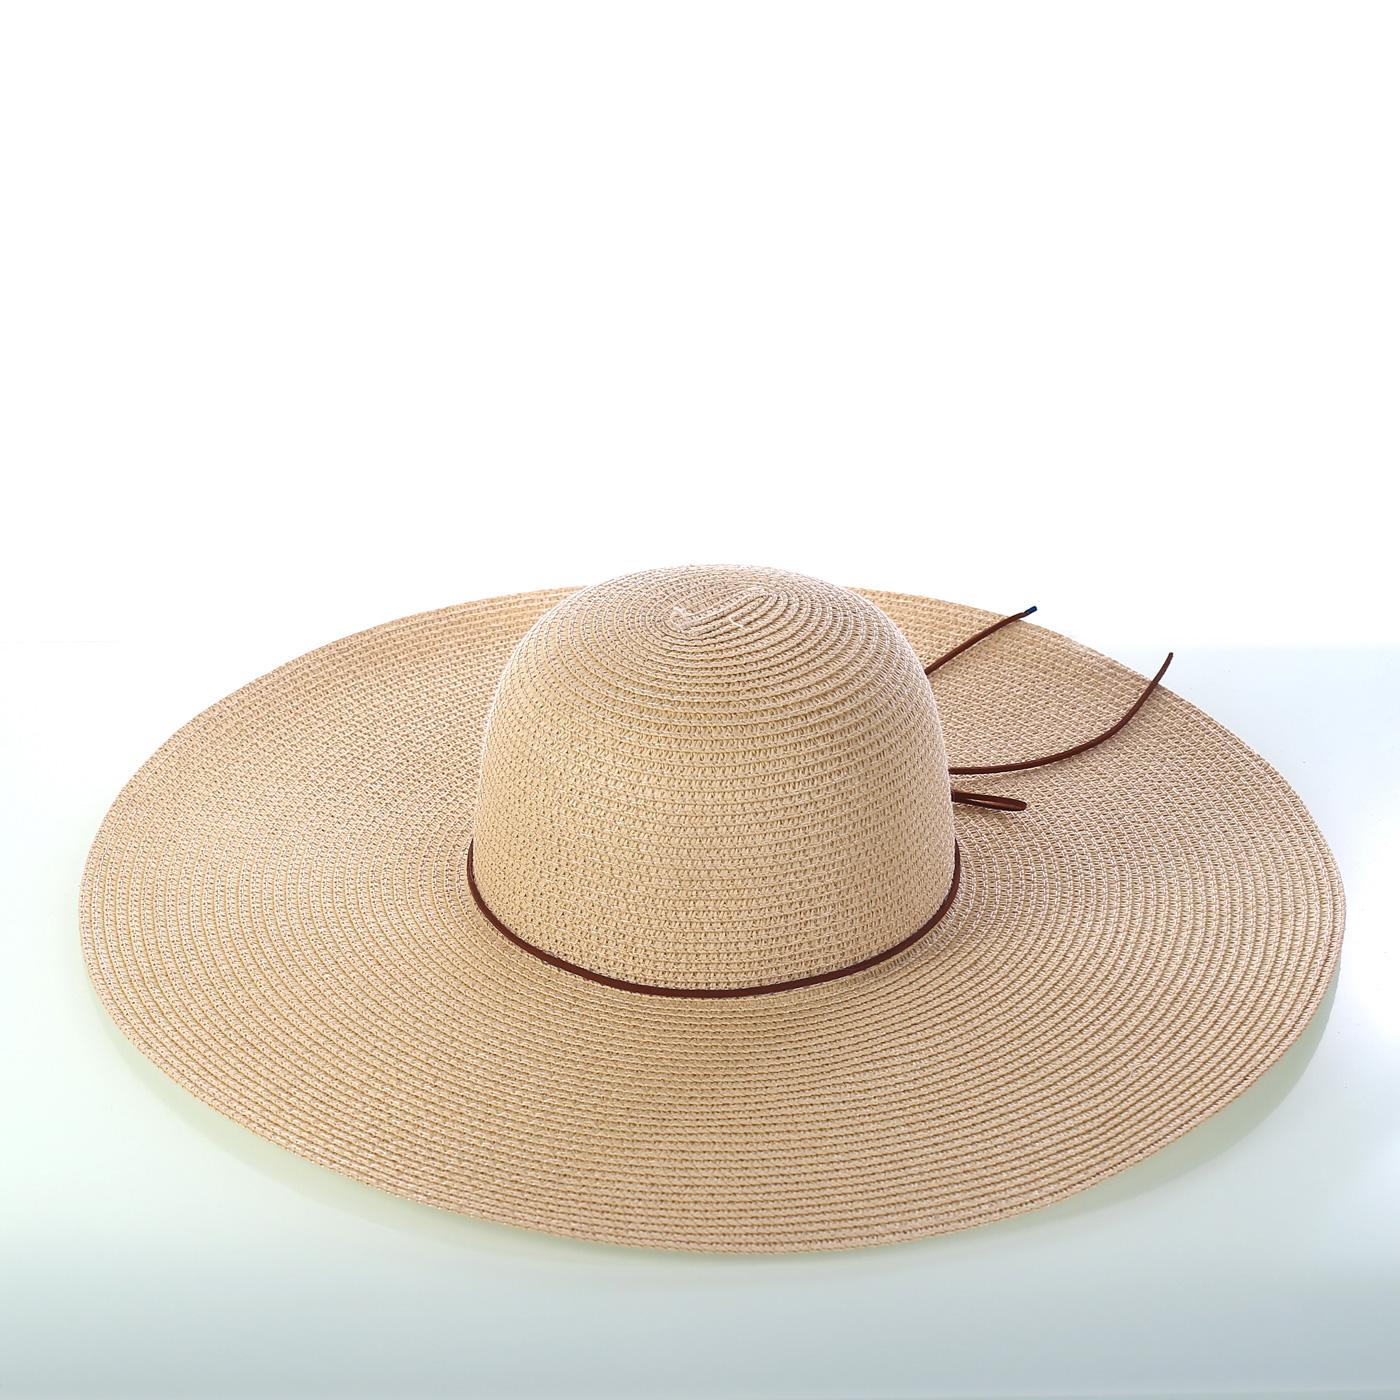 d095d4bab Dámsky klobúk z rafie Kbas KB019807